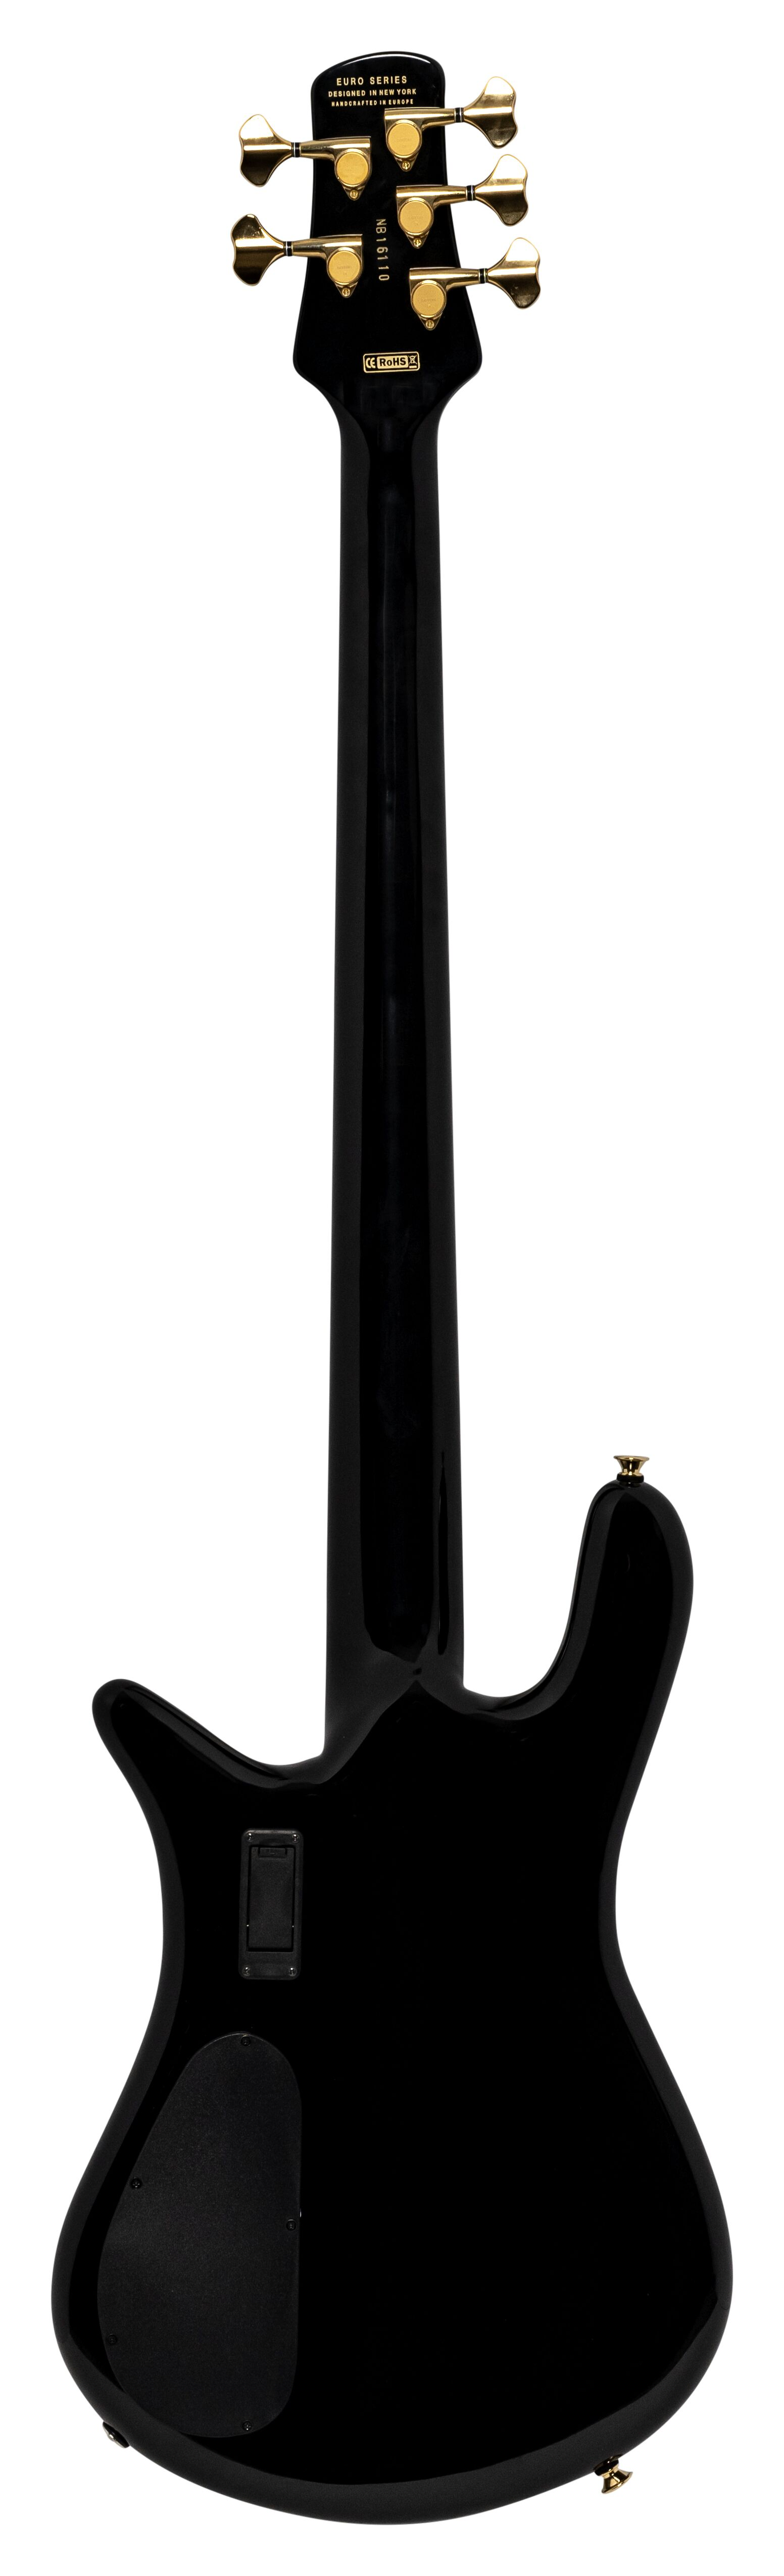 Spector Euro Classic5, Solid Black